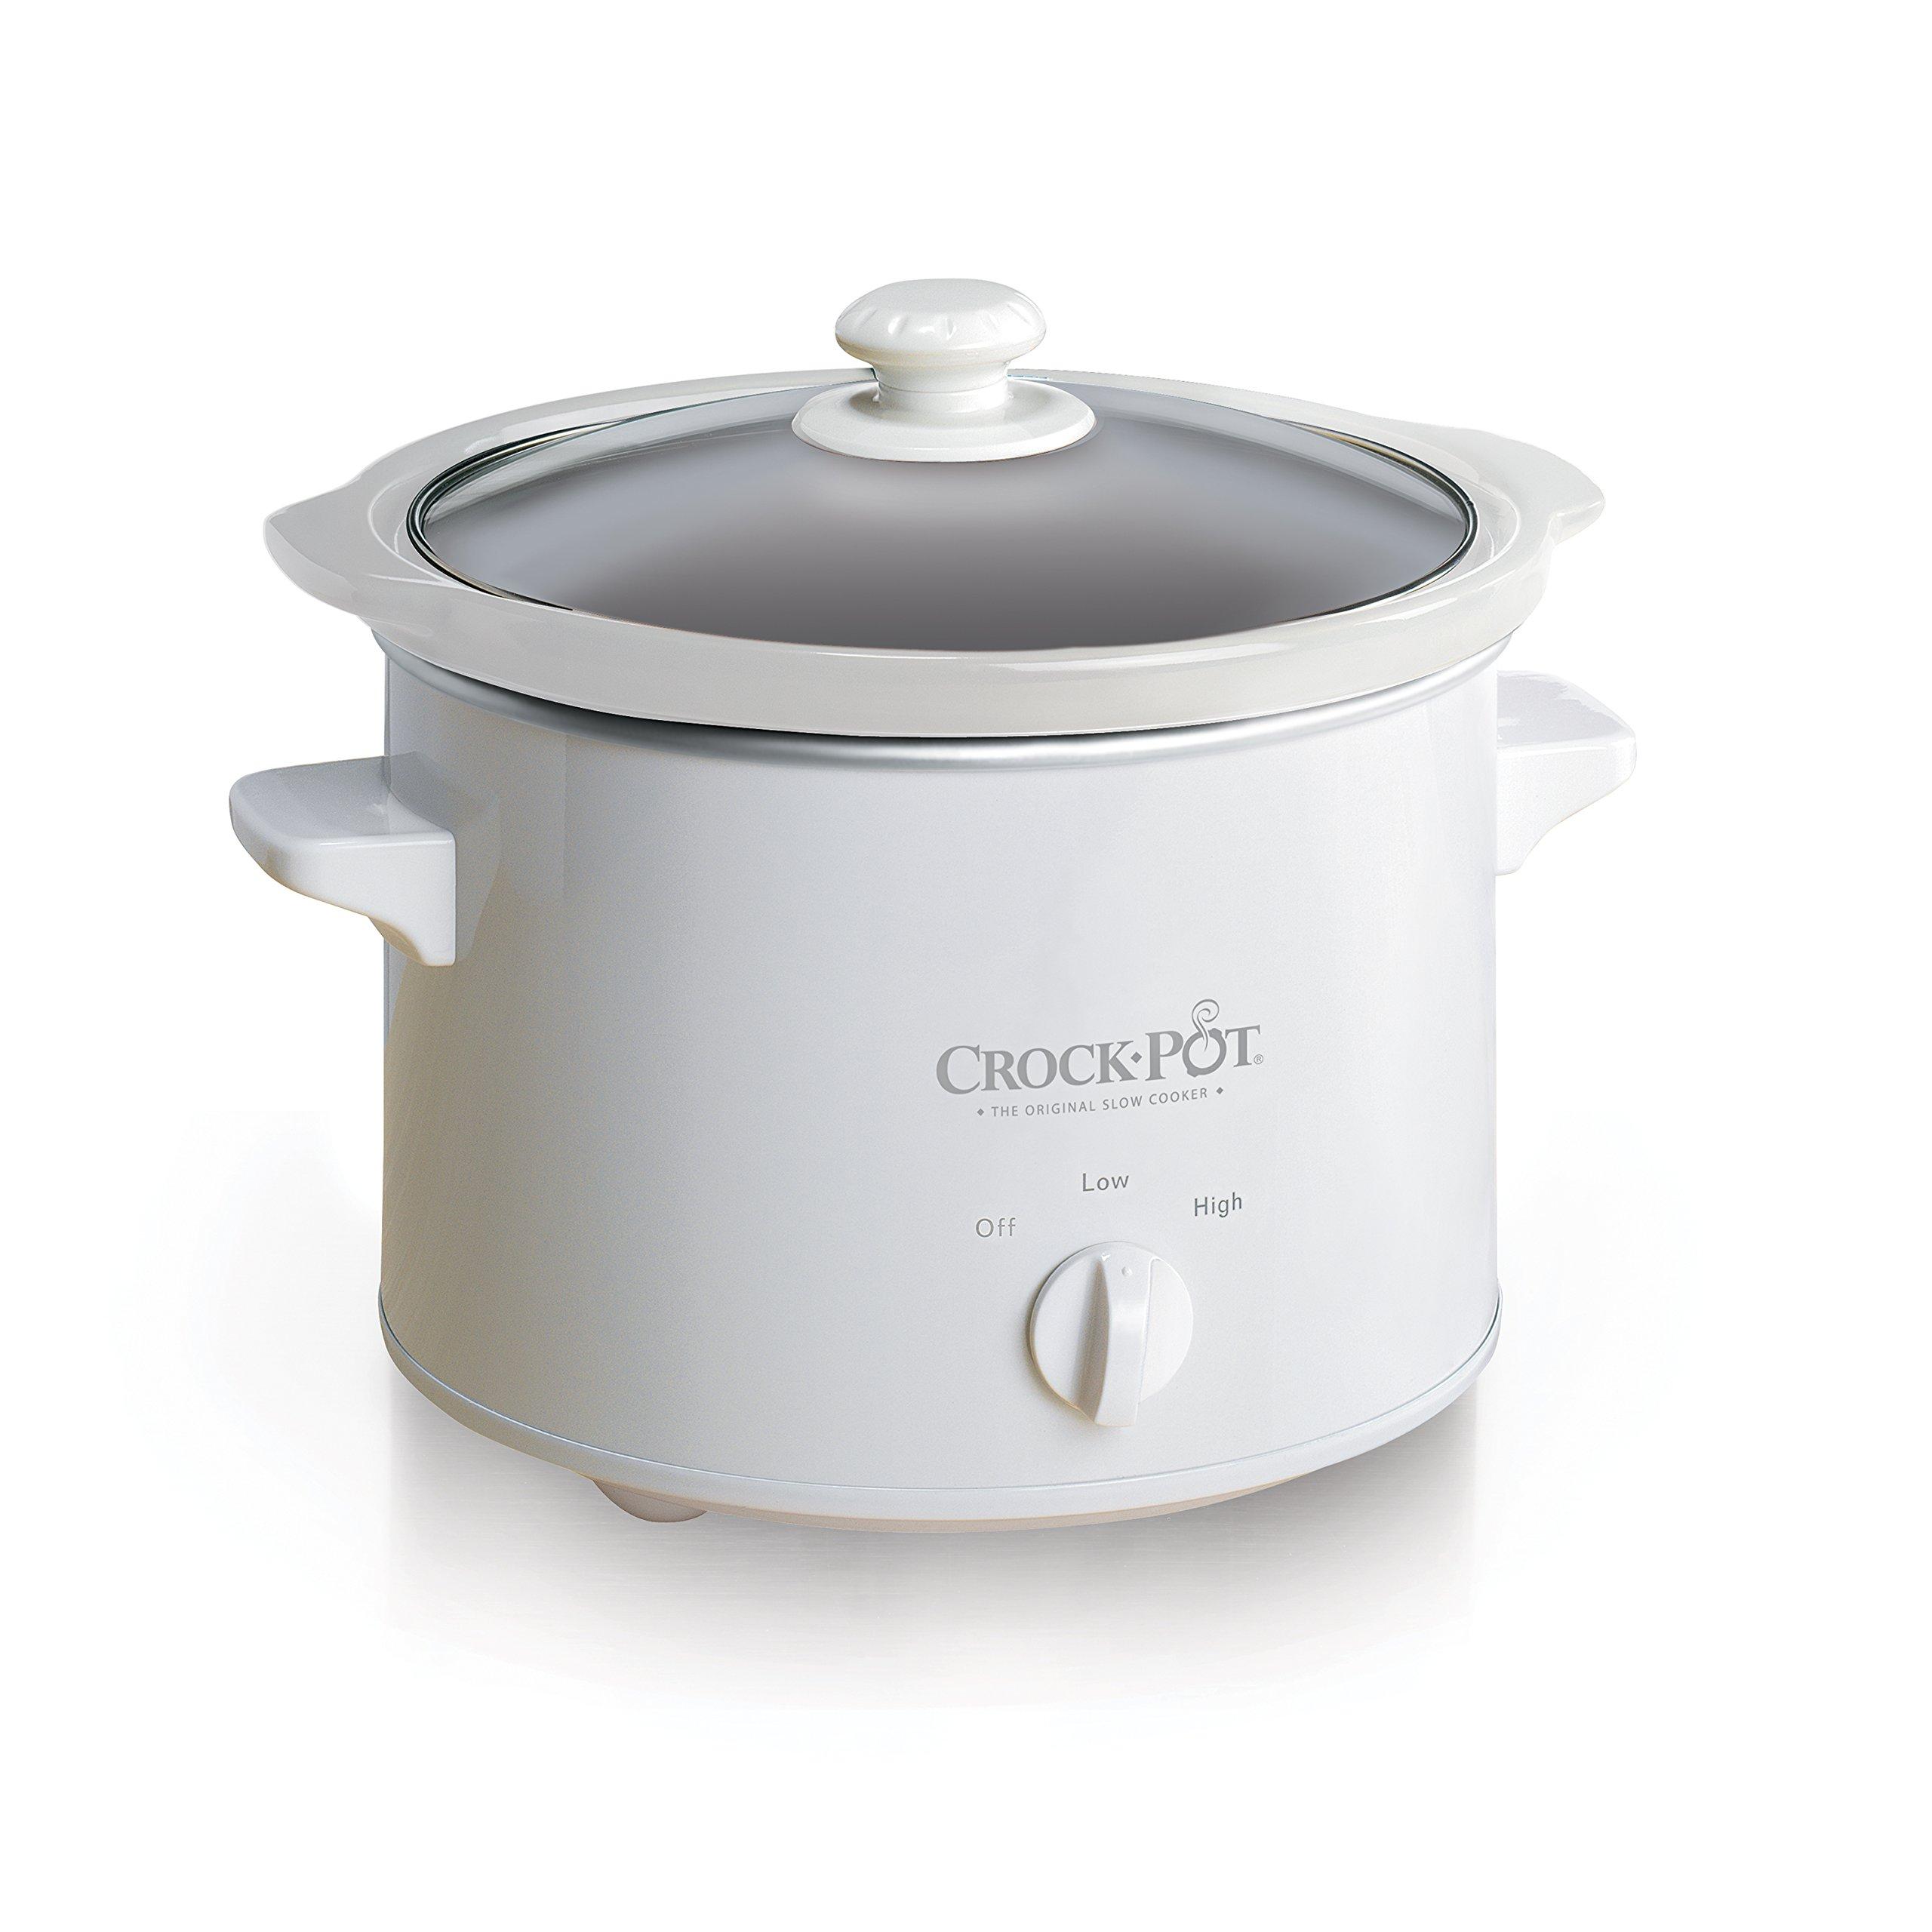 Mr. Coffee Crock-Pot 5025-WG-NP 2.5QT, White Slow Cooker, 2.5 quarts,